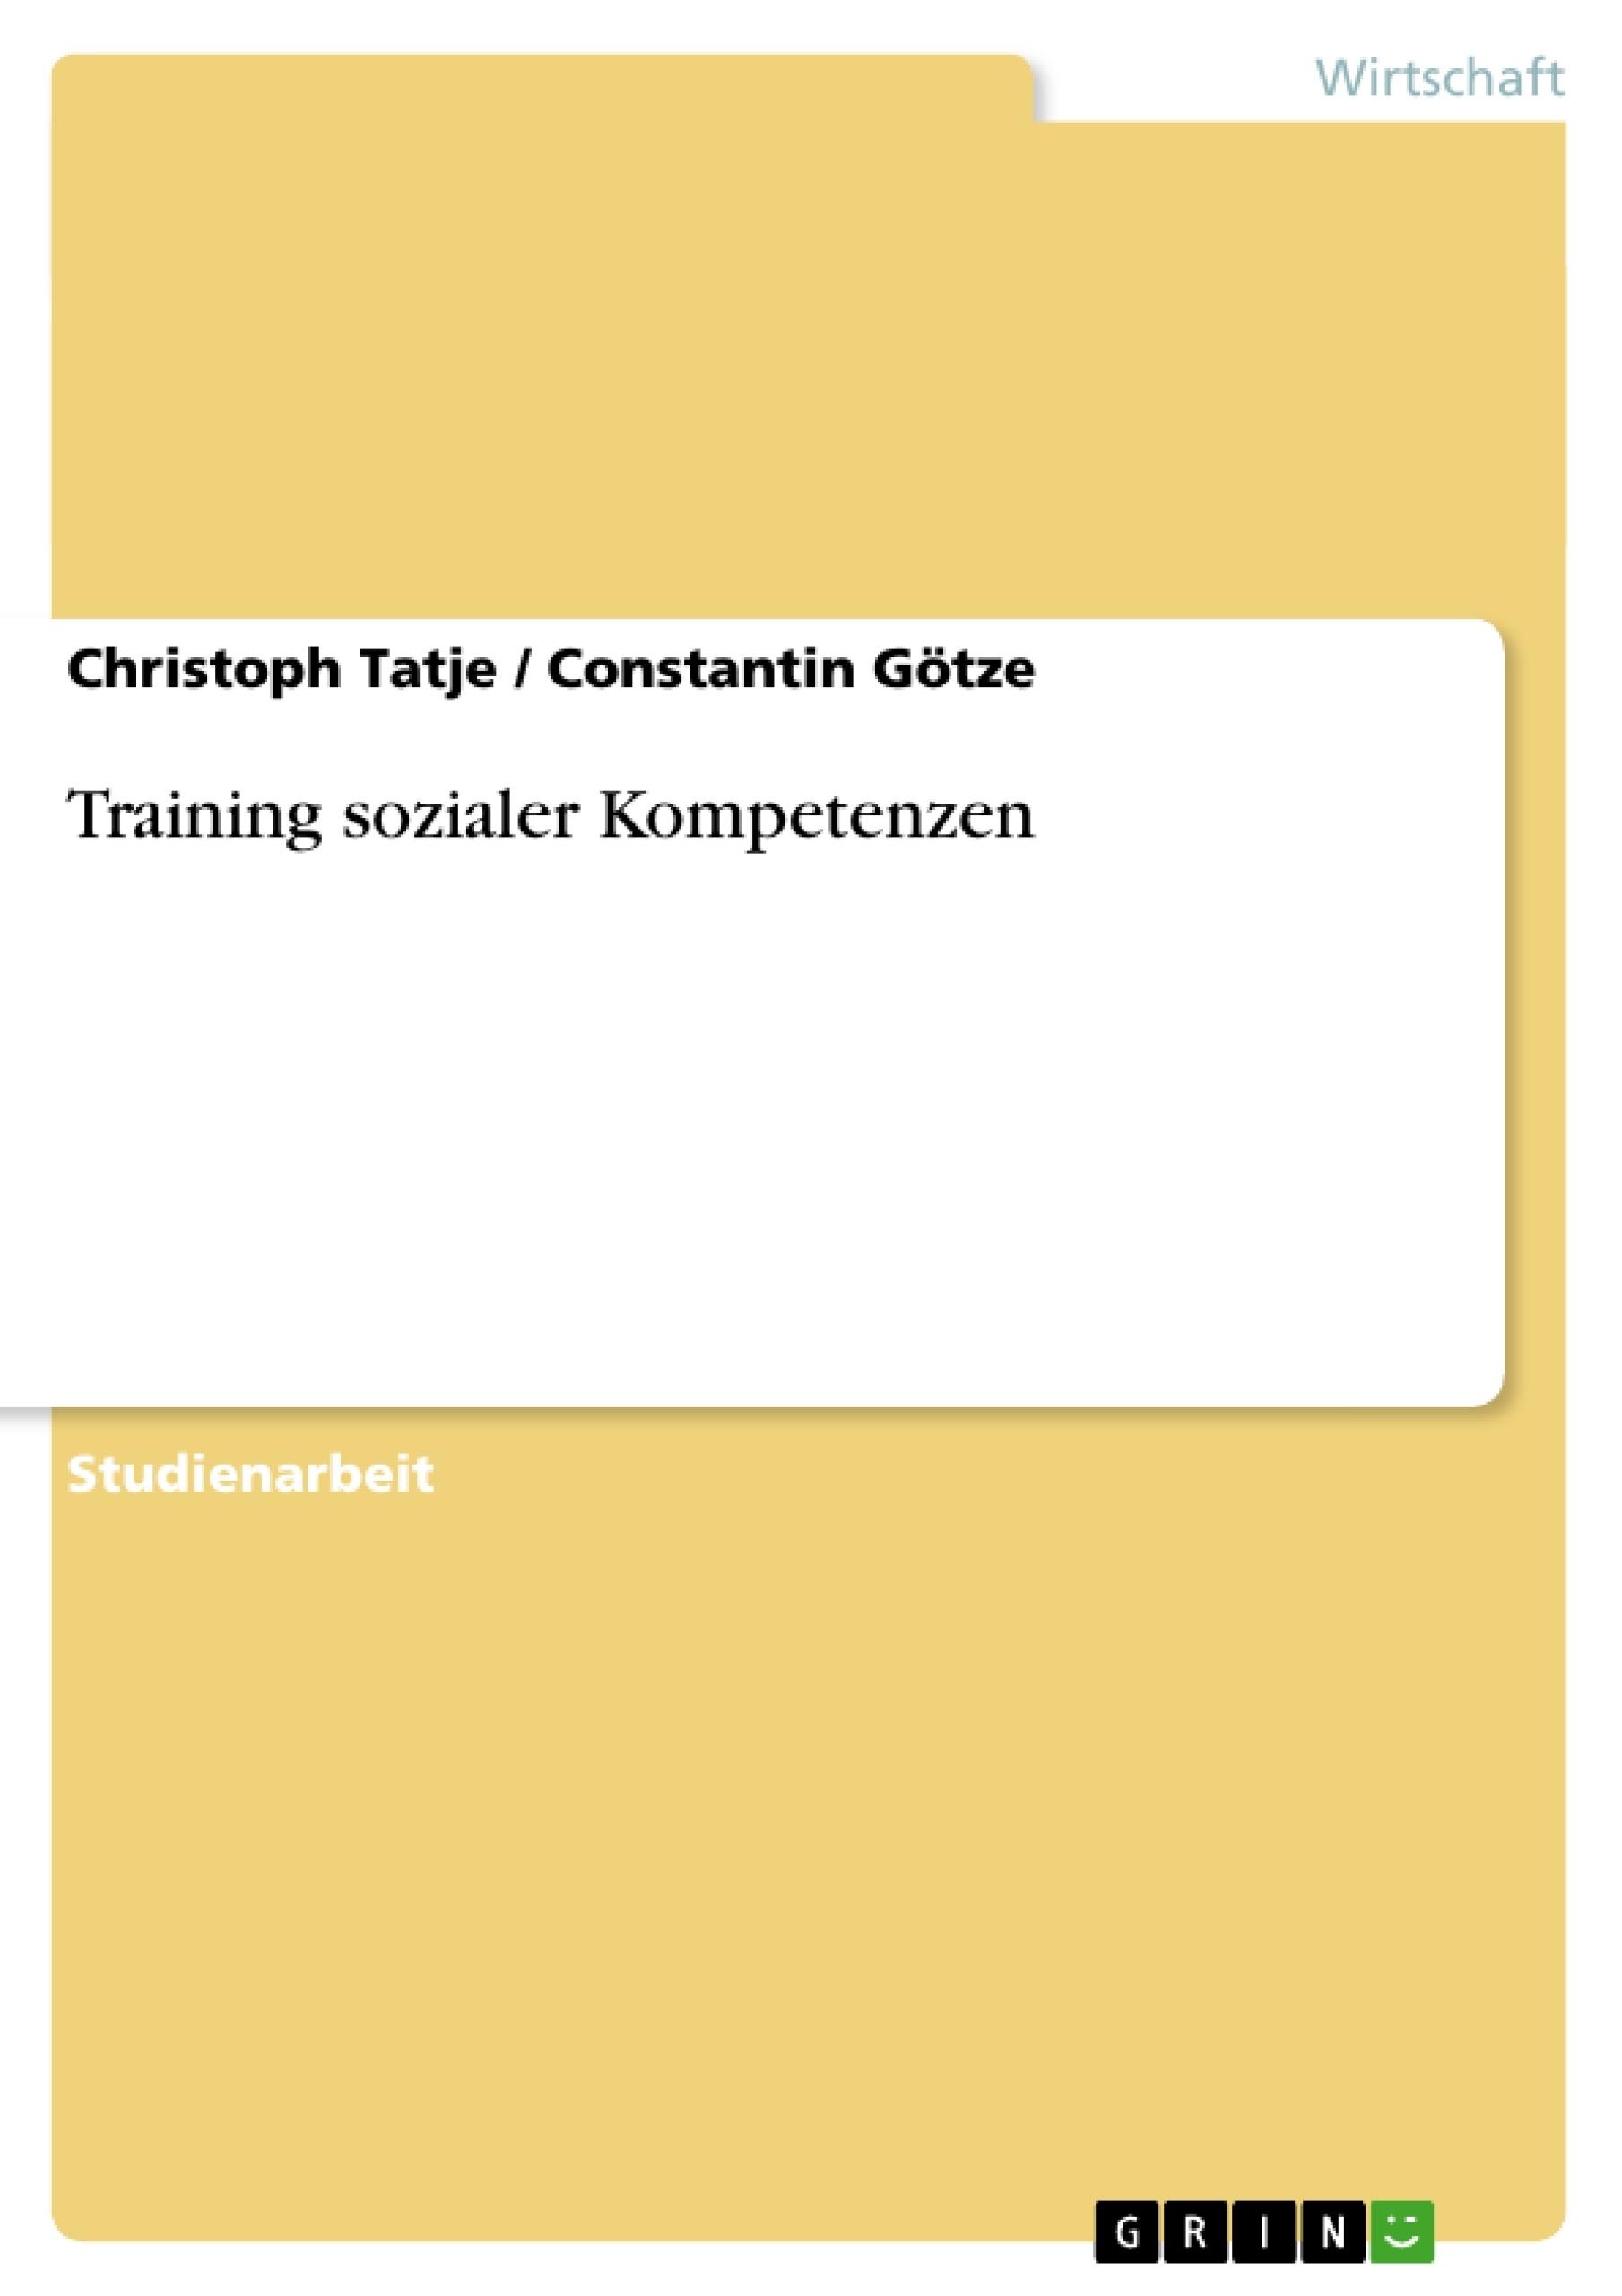 Titel: Training sozialer Kompetenzen